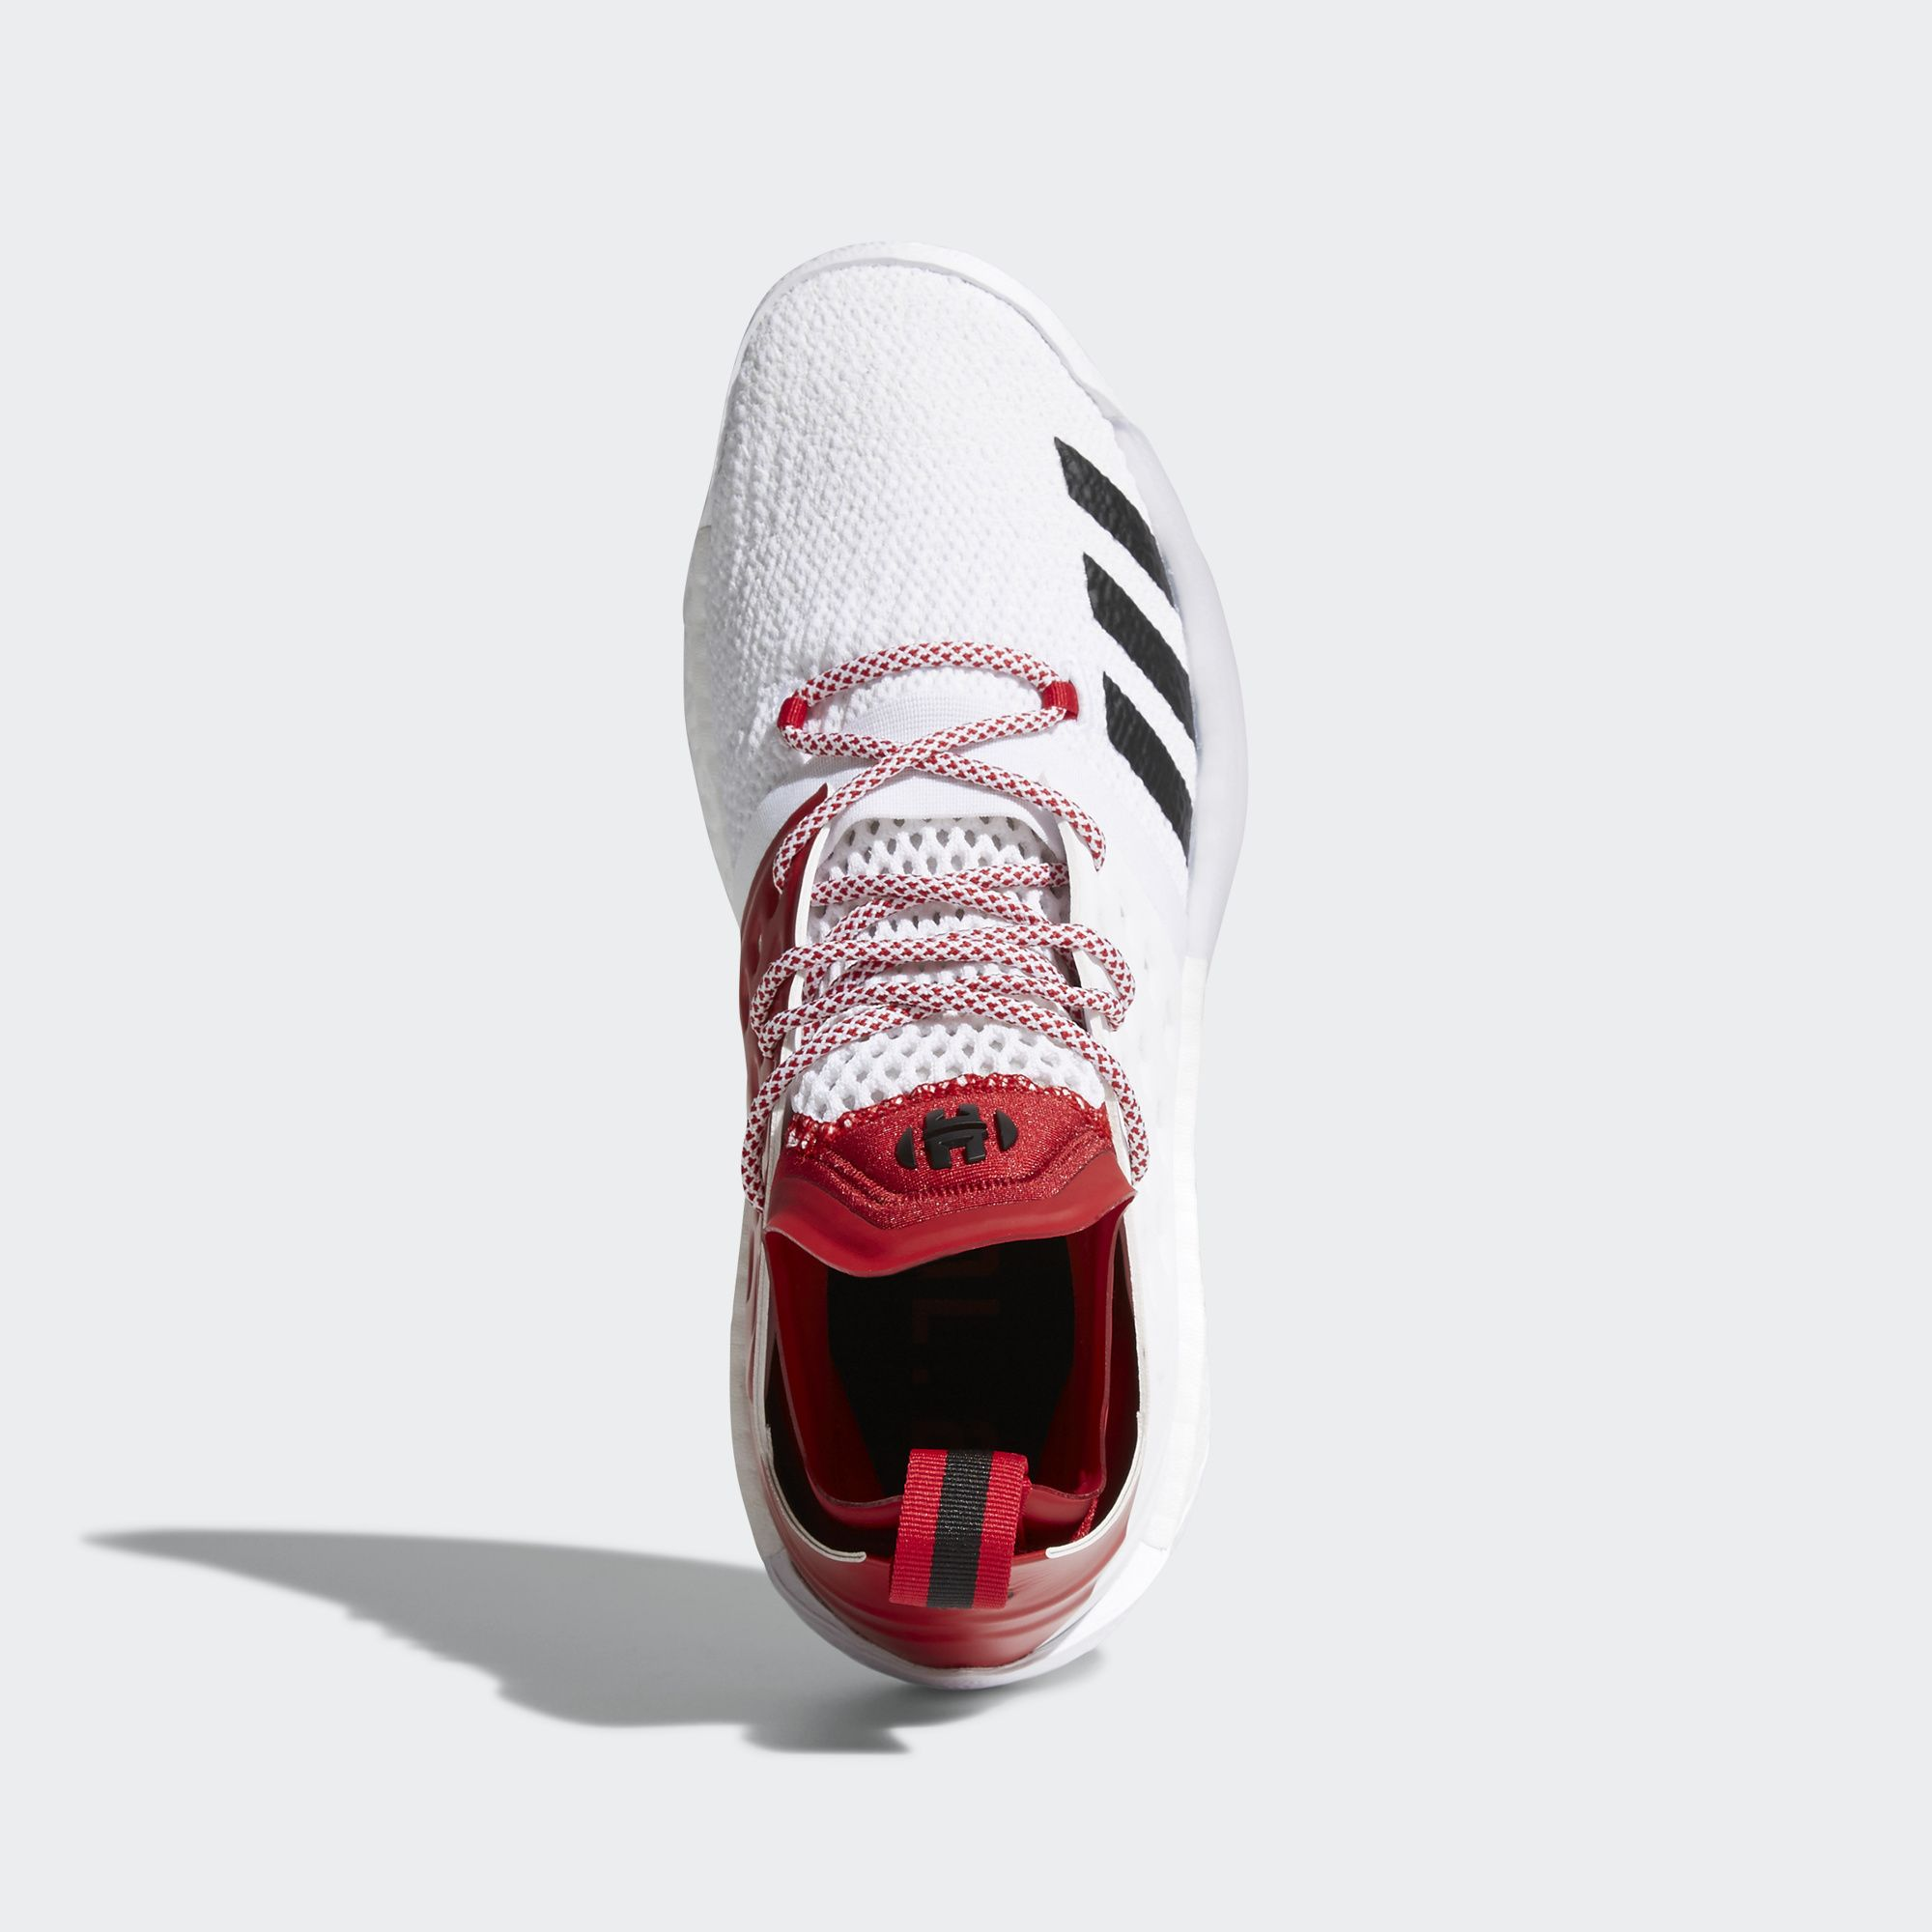 e3b76de8b10 adidas-harden-vol2-mm-35 - WearTesters